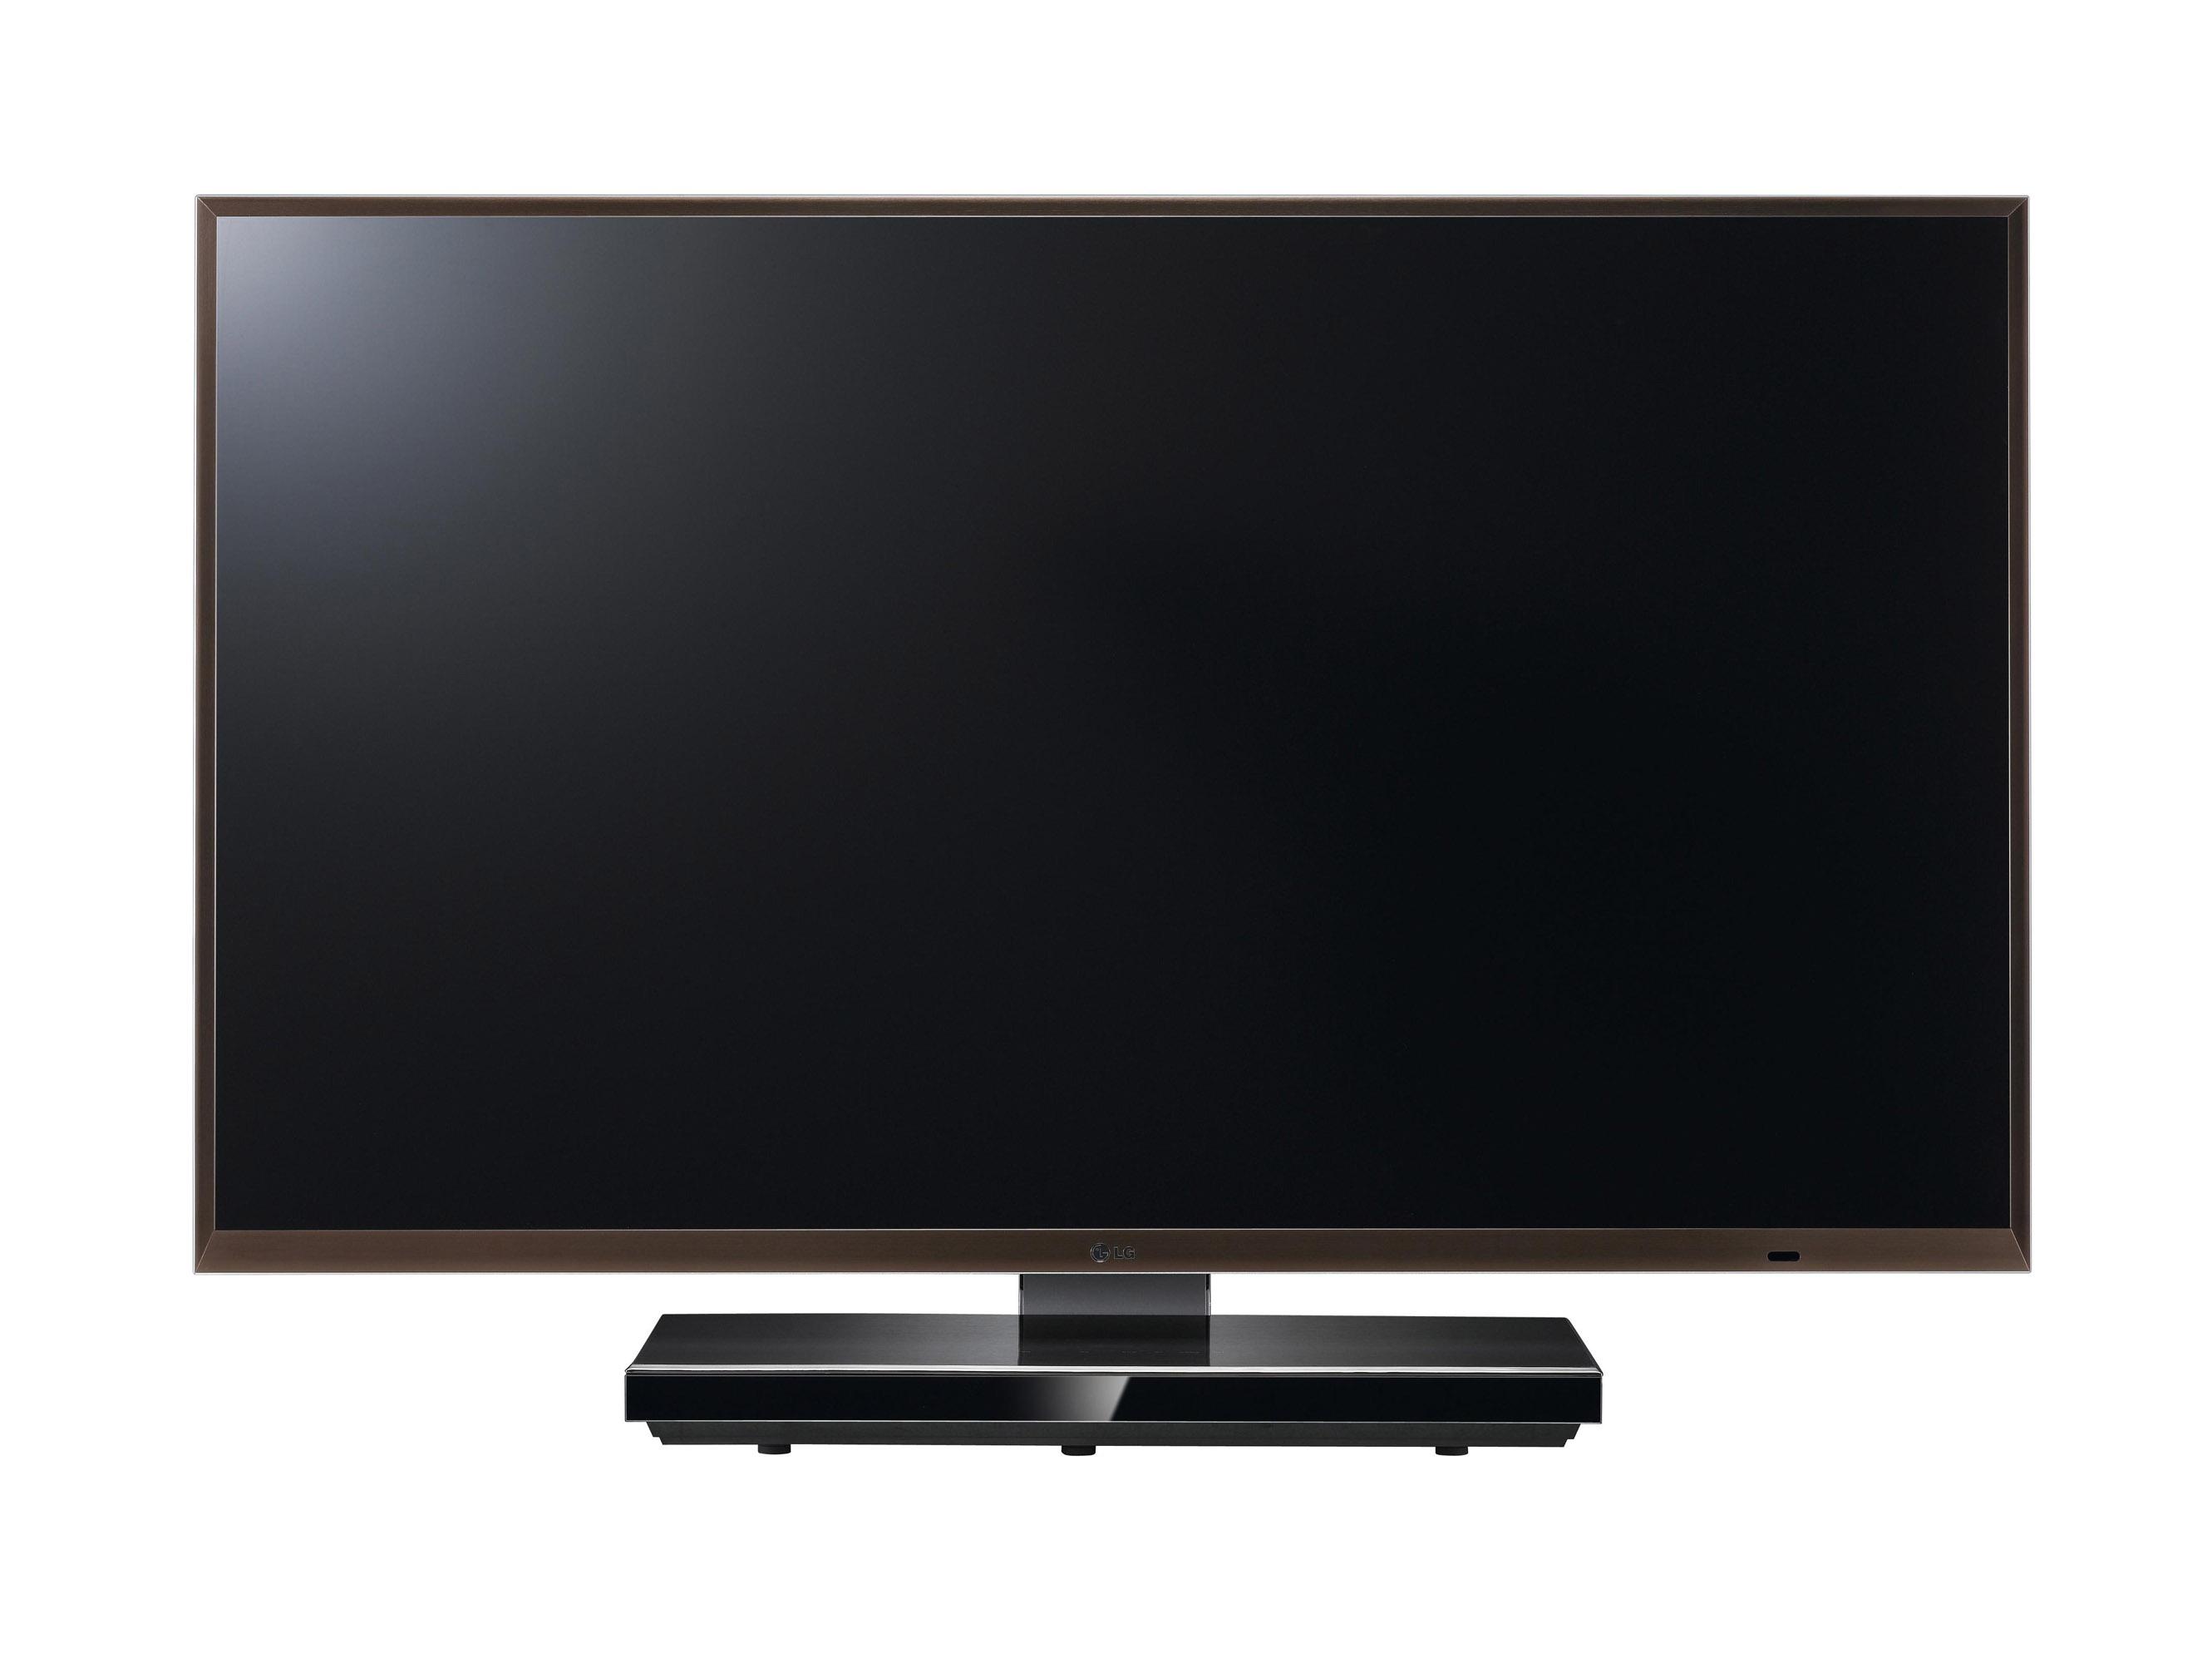 Samsung un55f6300 55` 120hz 1080p wifi led slim smart hdtv wall mount bundle